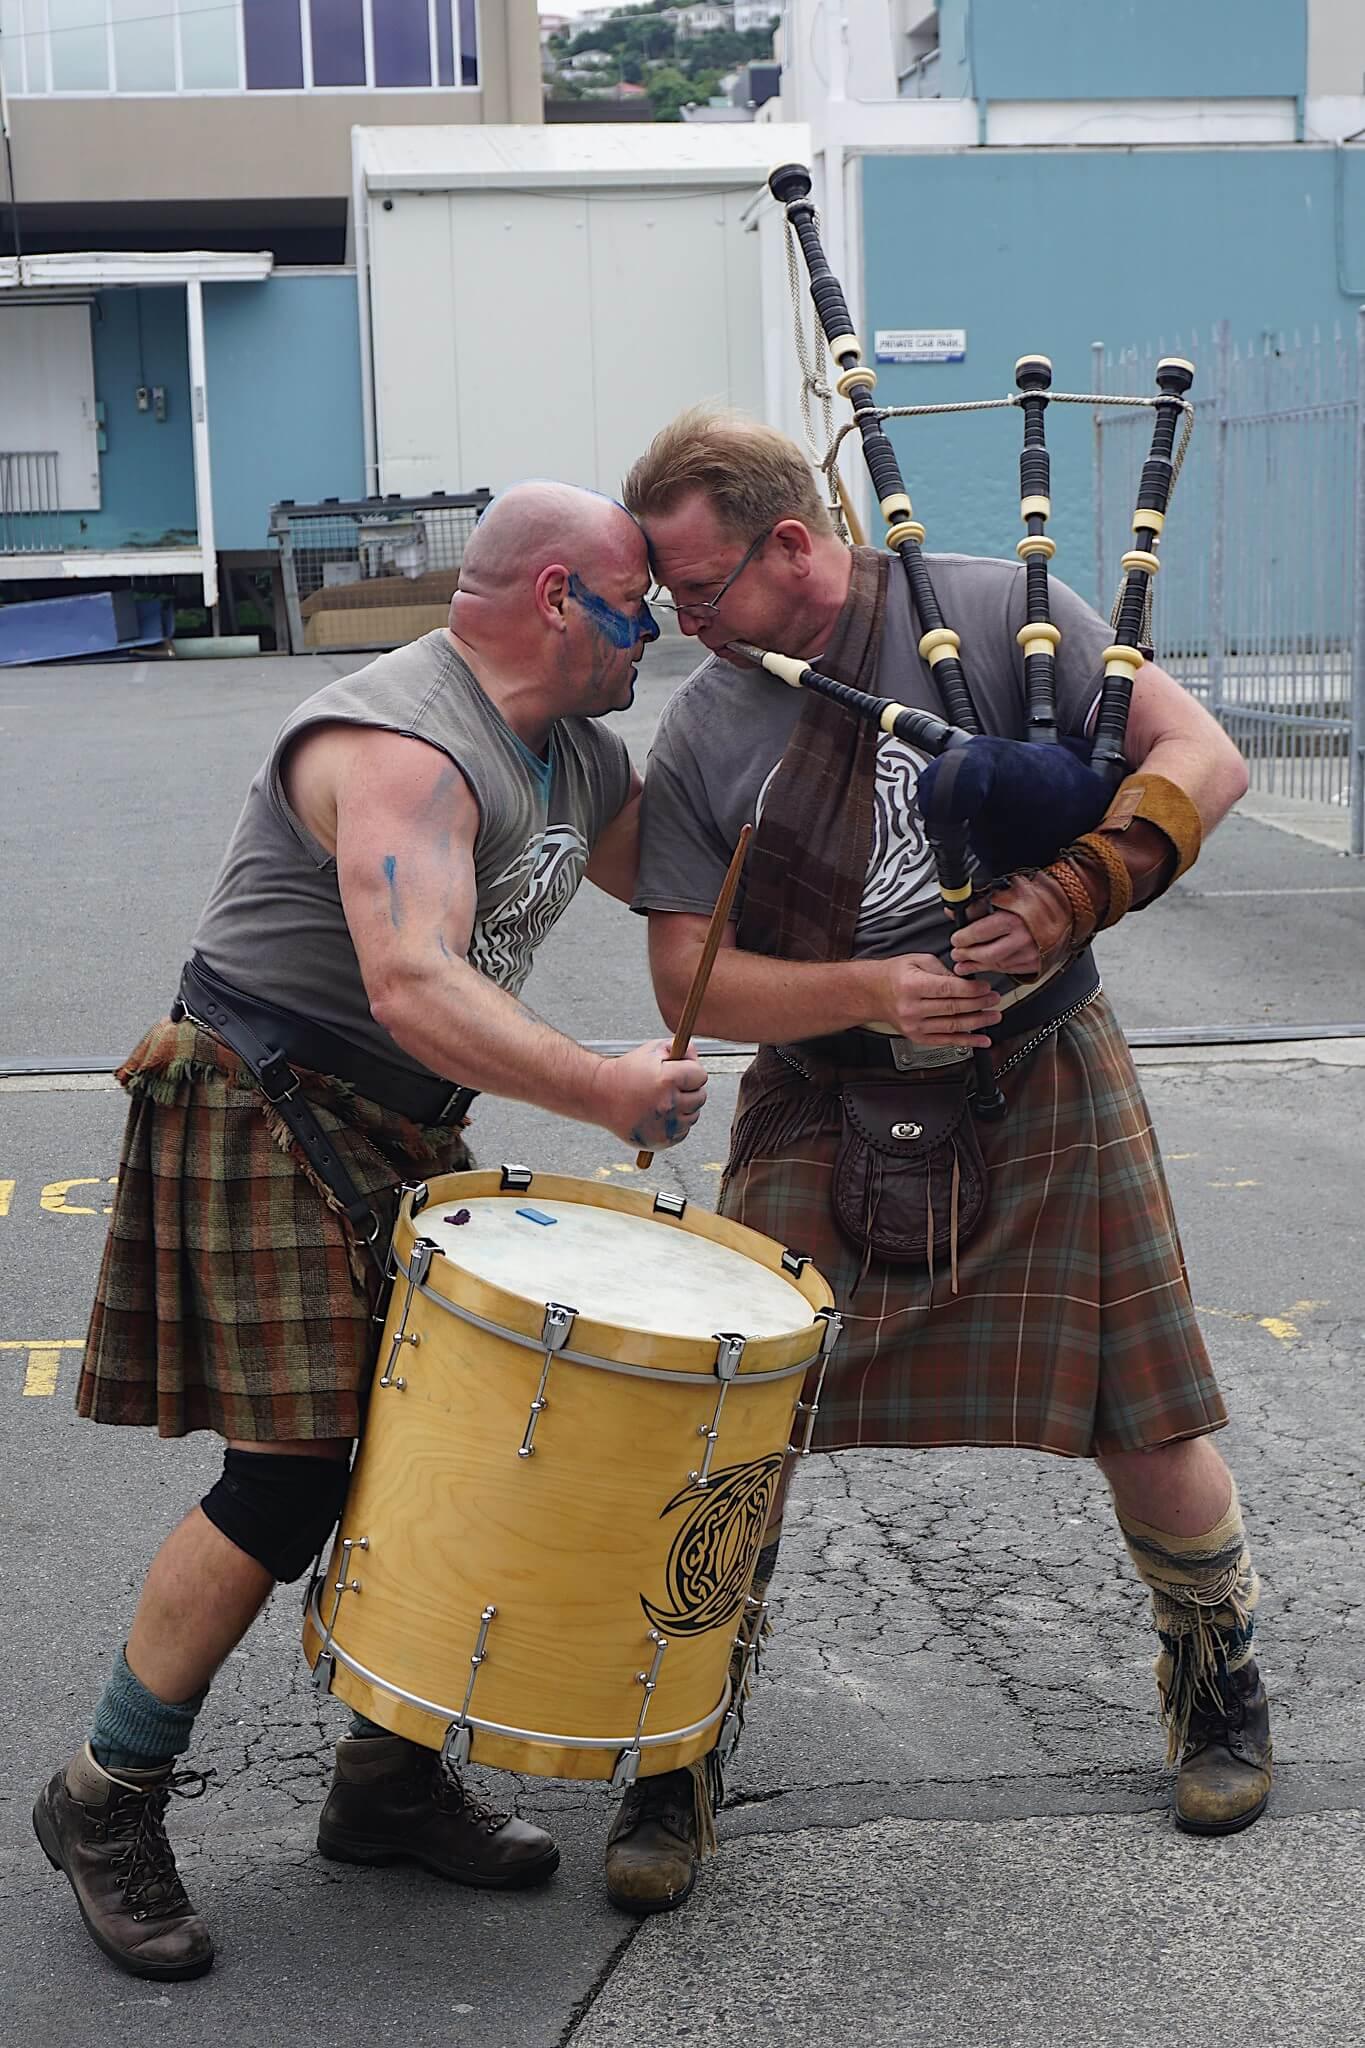 Two Kiwi men putting on a performance at CubaDupa festival in Wellington